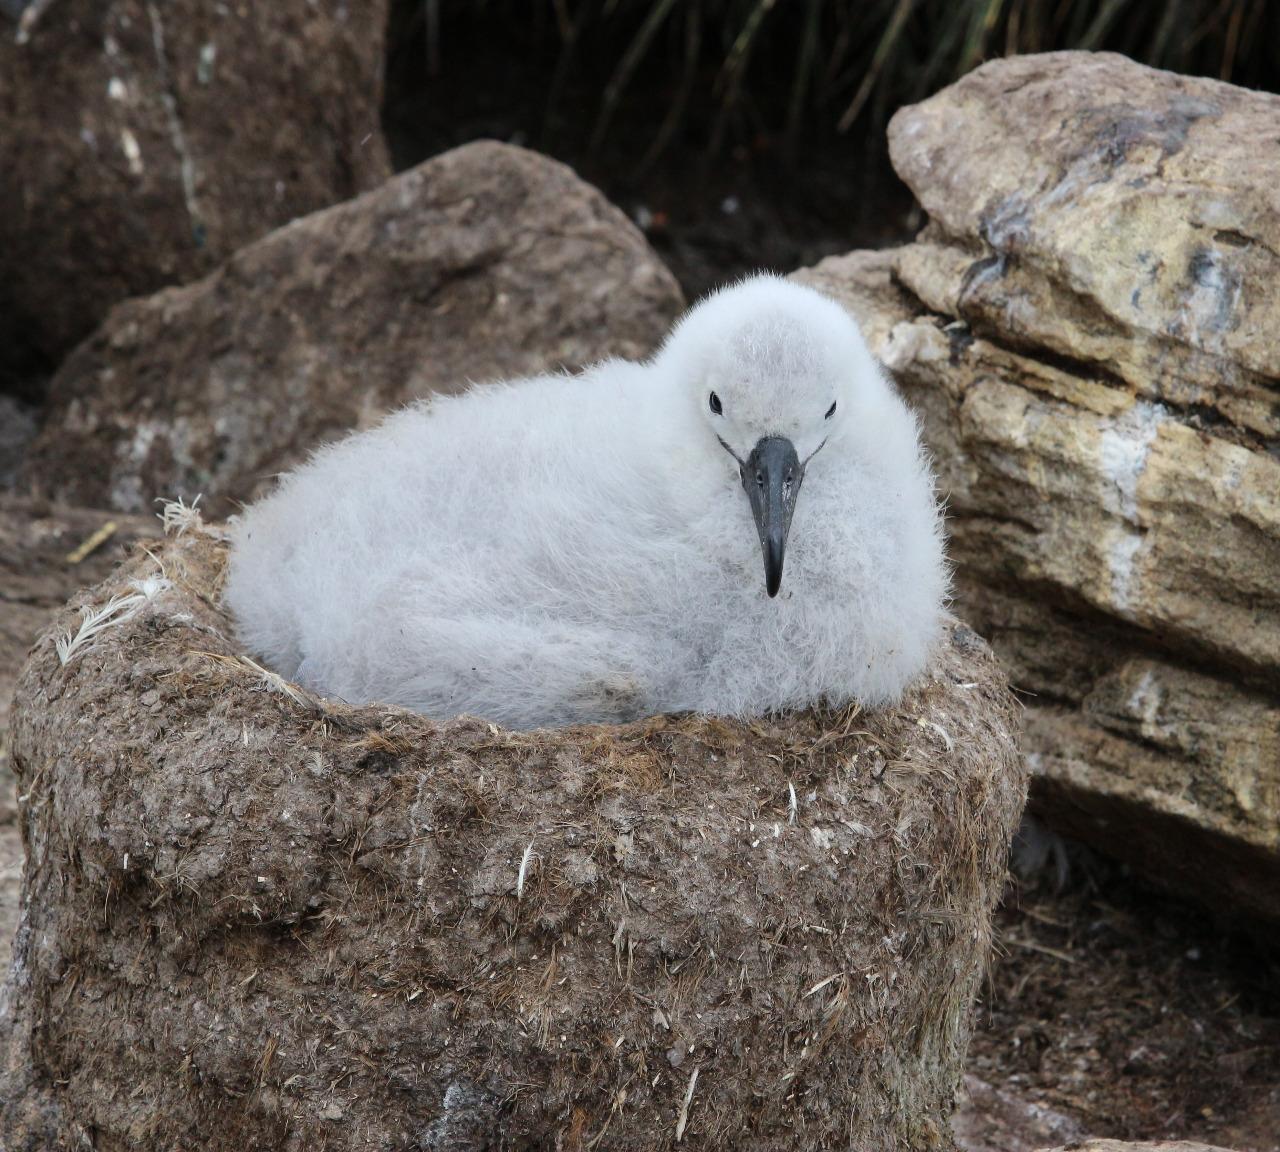 Black-browed albatross chick on nest